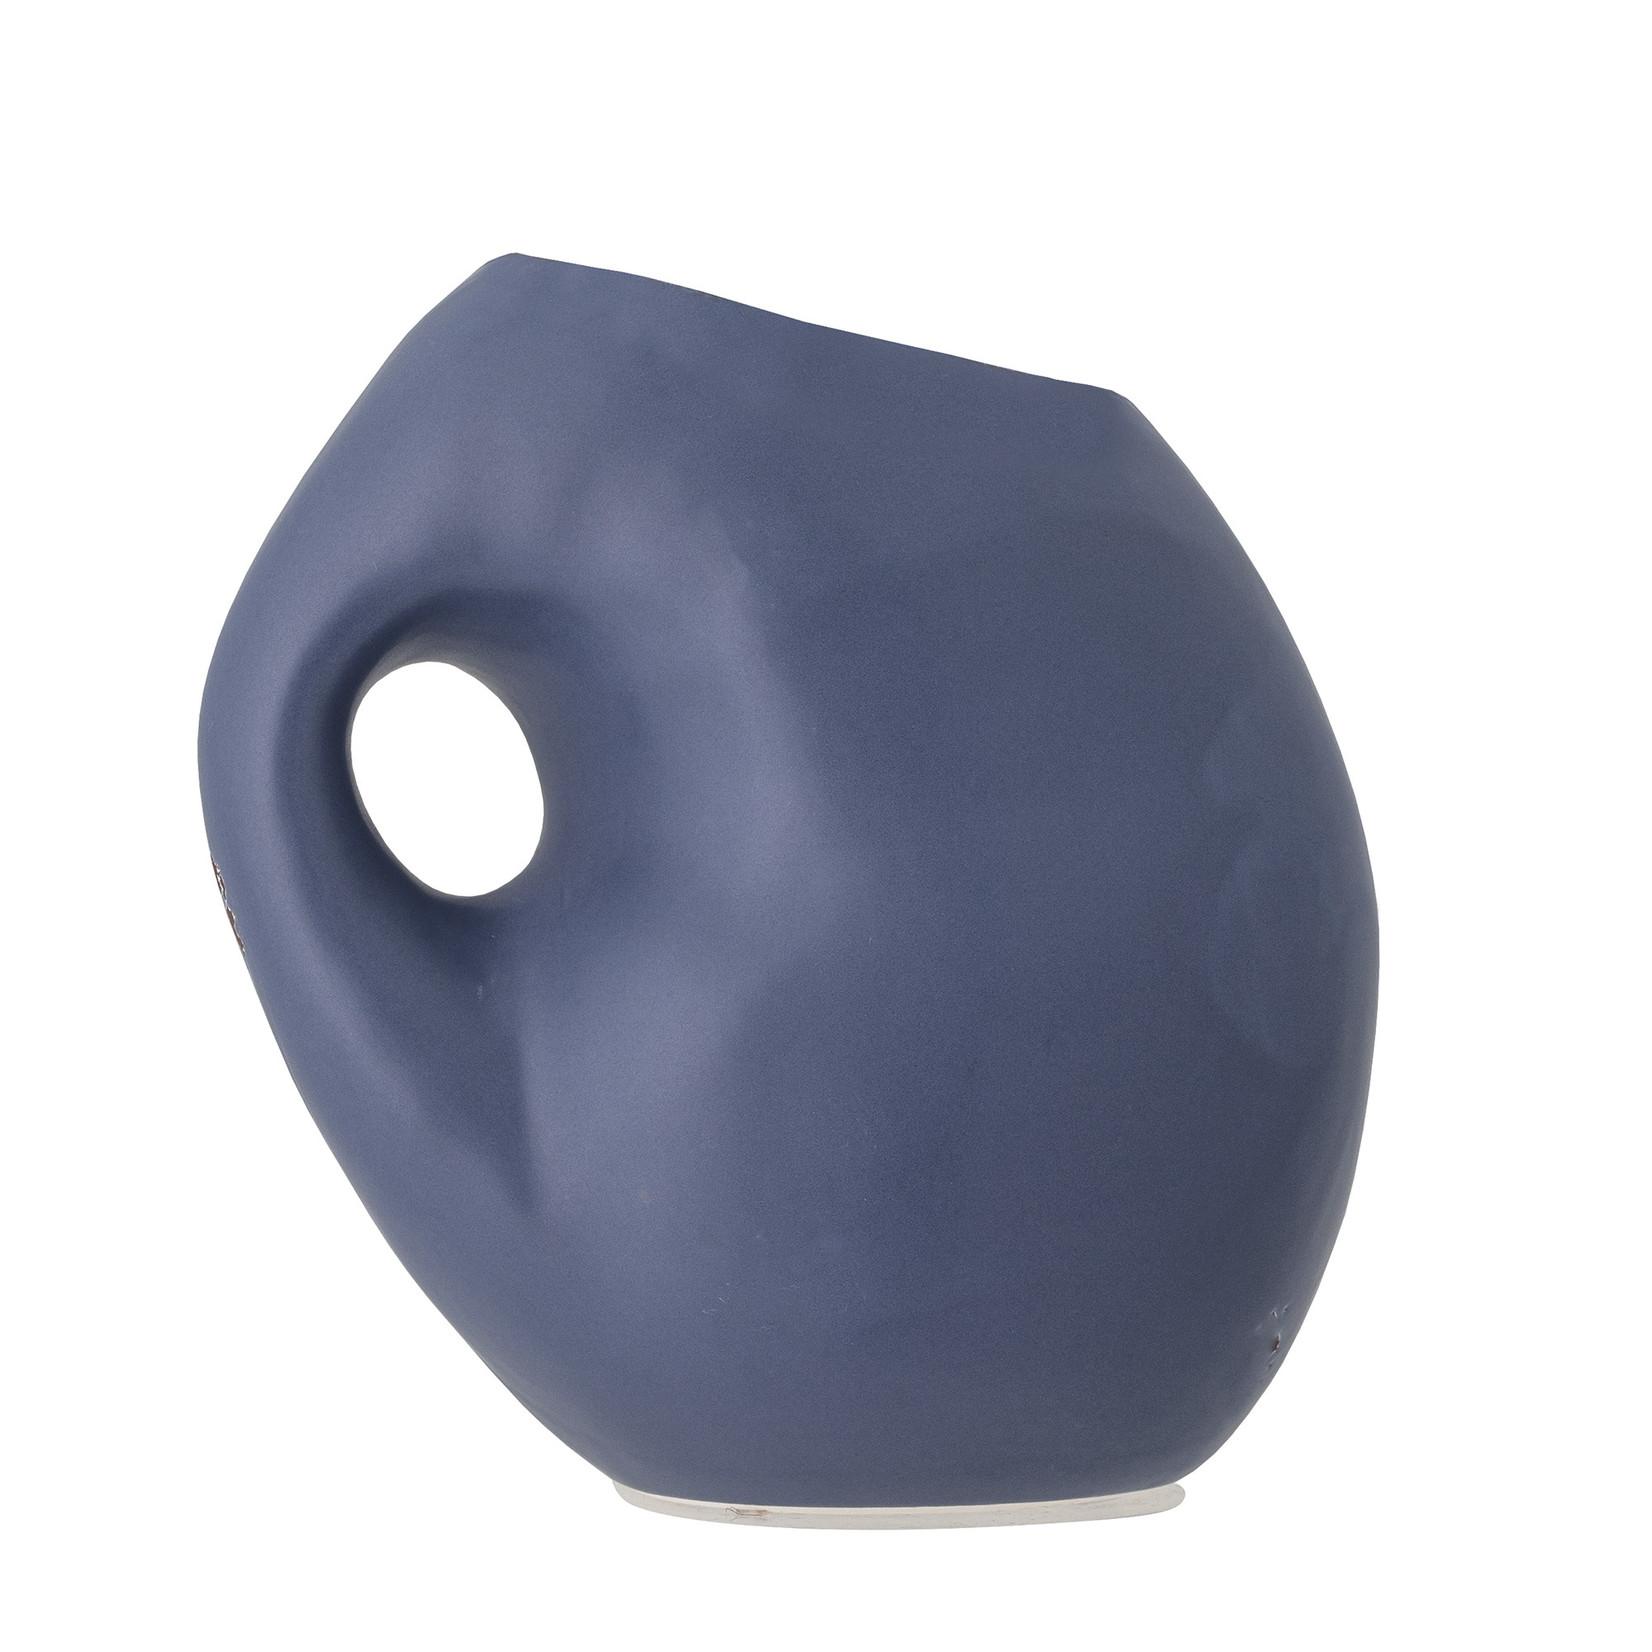 Bloomingville Asya Vaas - blauw keramiek